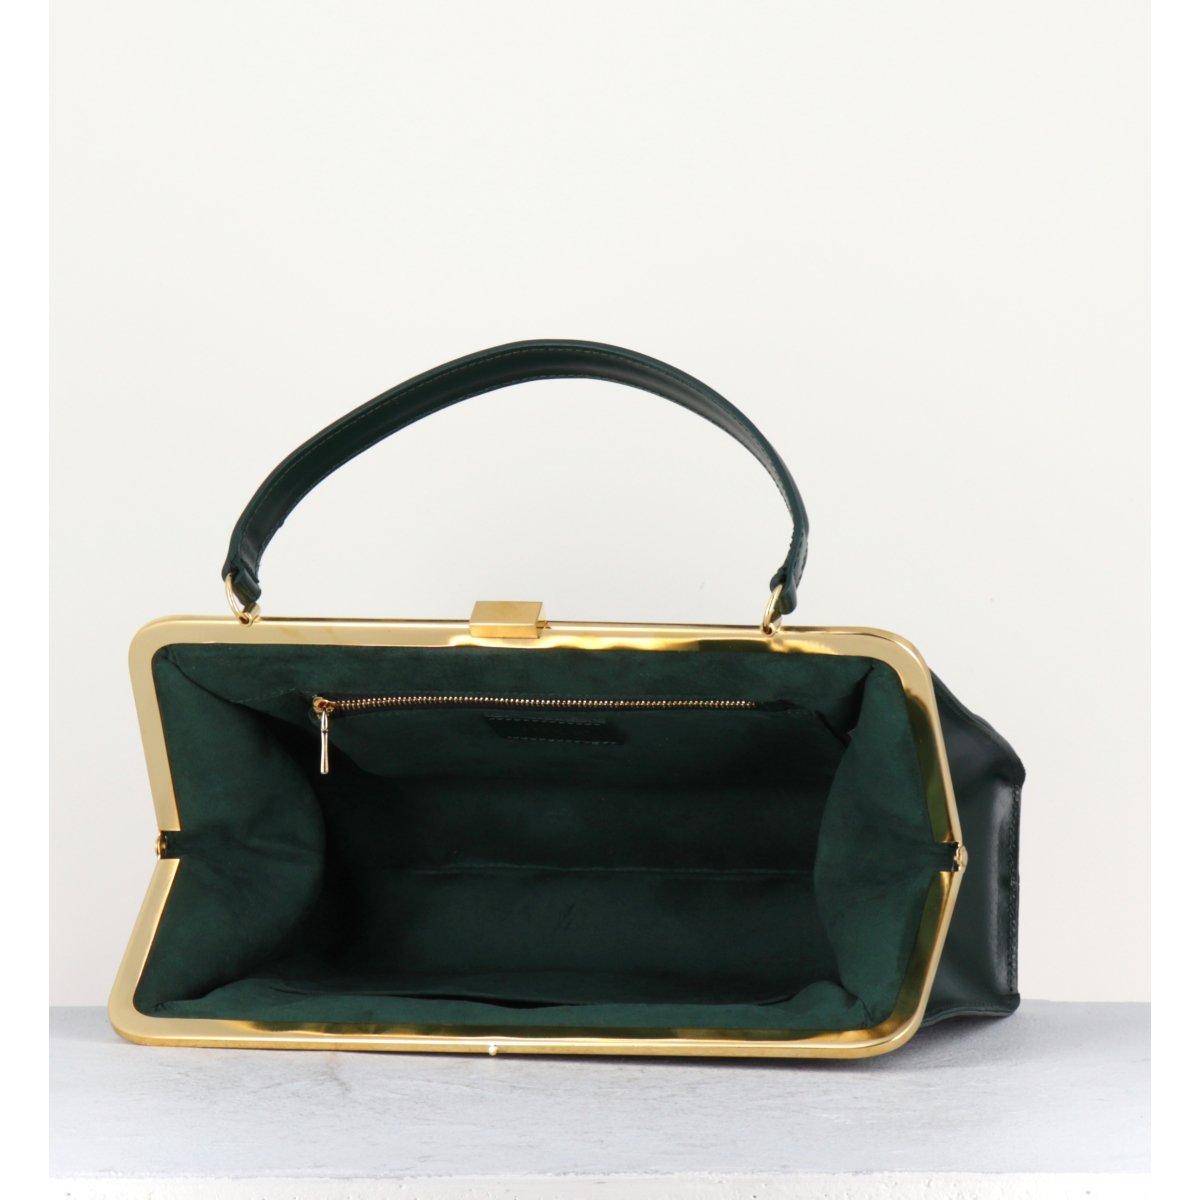 GREEN CLASP BAG